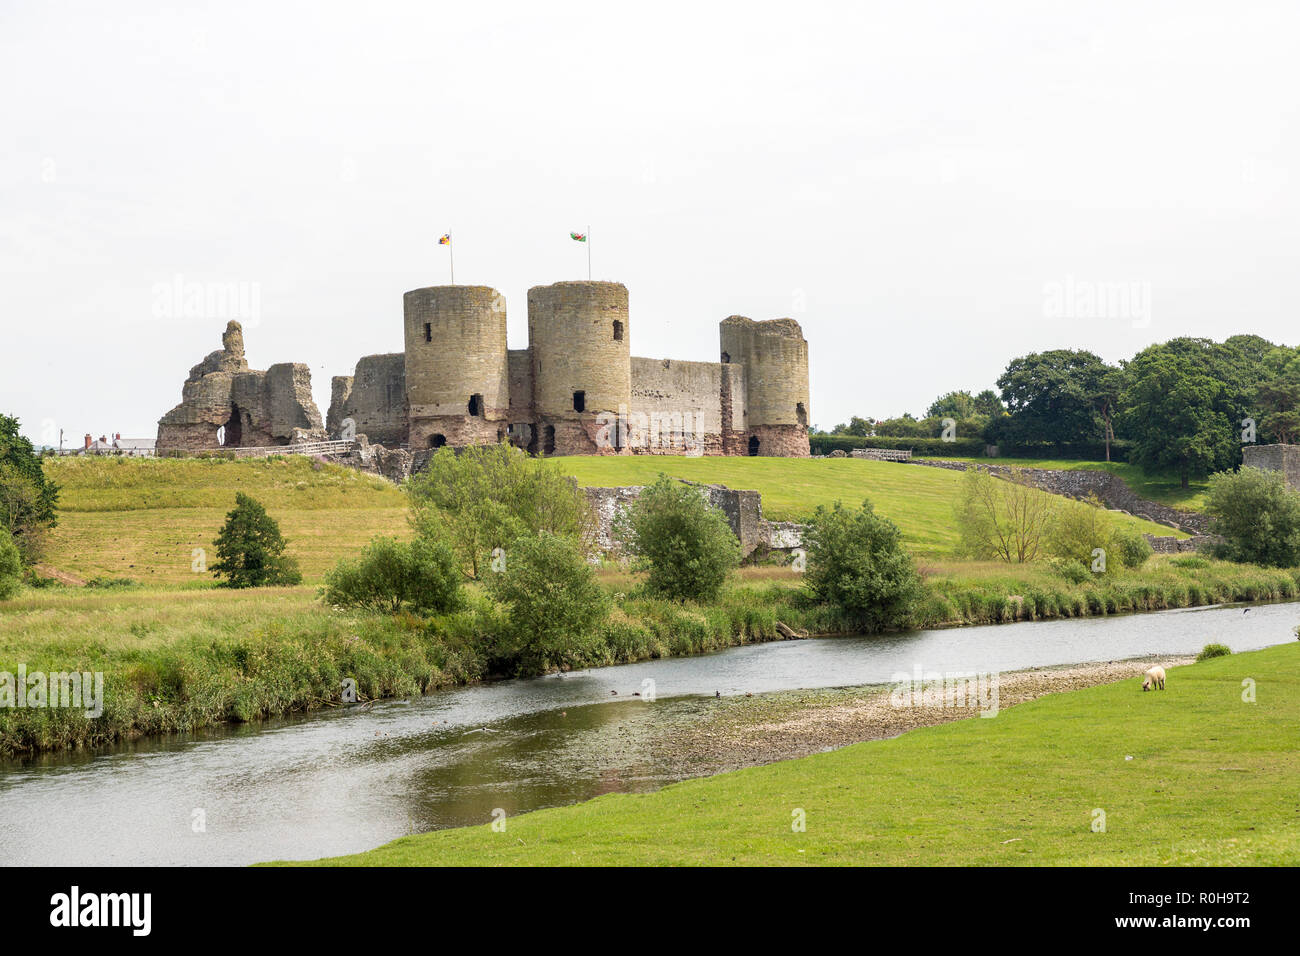 River Clwyd and Rhuddlan Castle, Rhuddlan, Denbighshire, Wales, UK - Stock Image